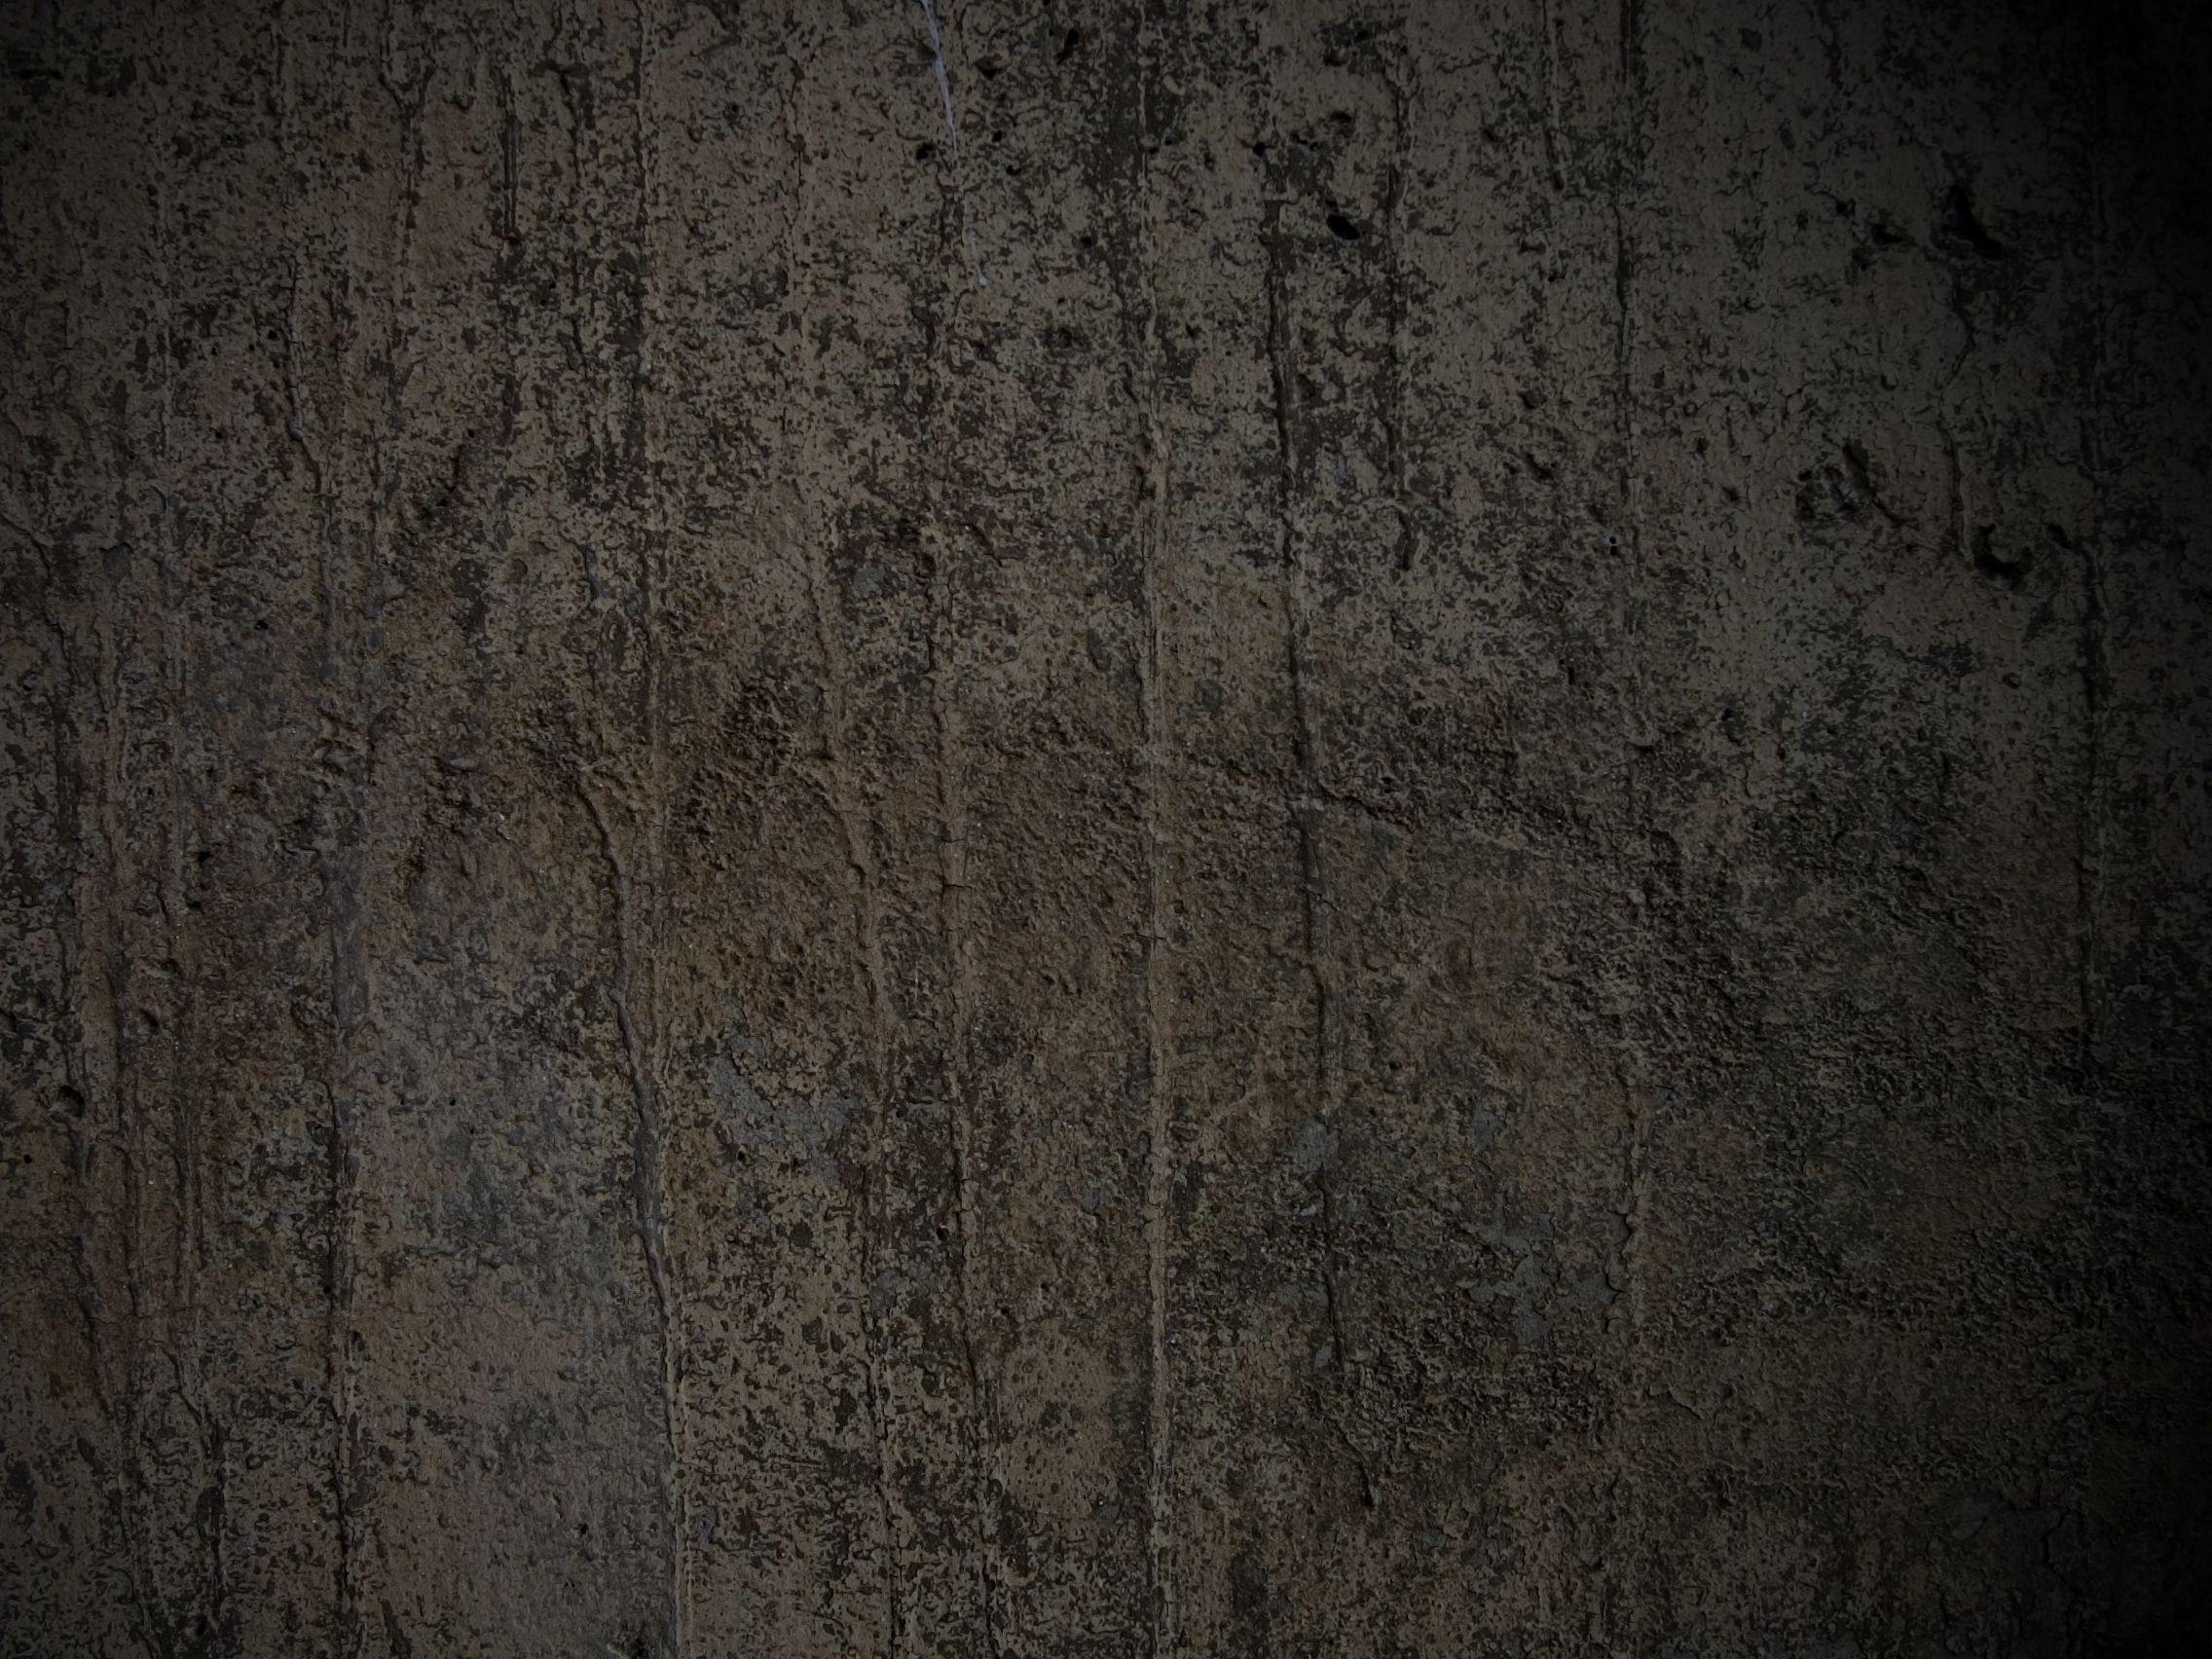 background gray texture Pesquisa Google BG Pinterest